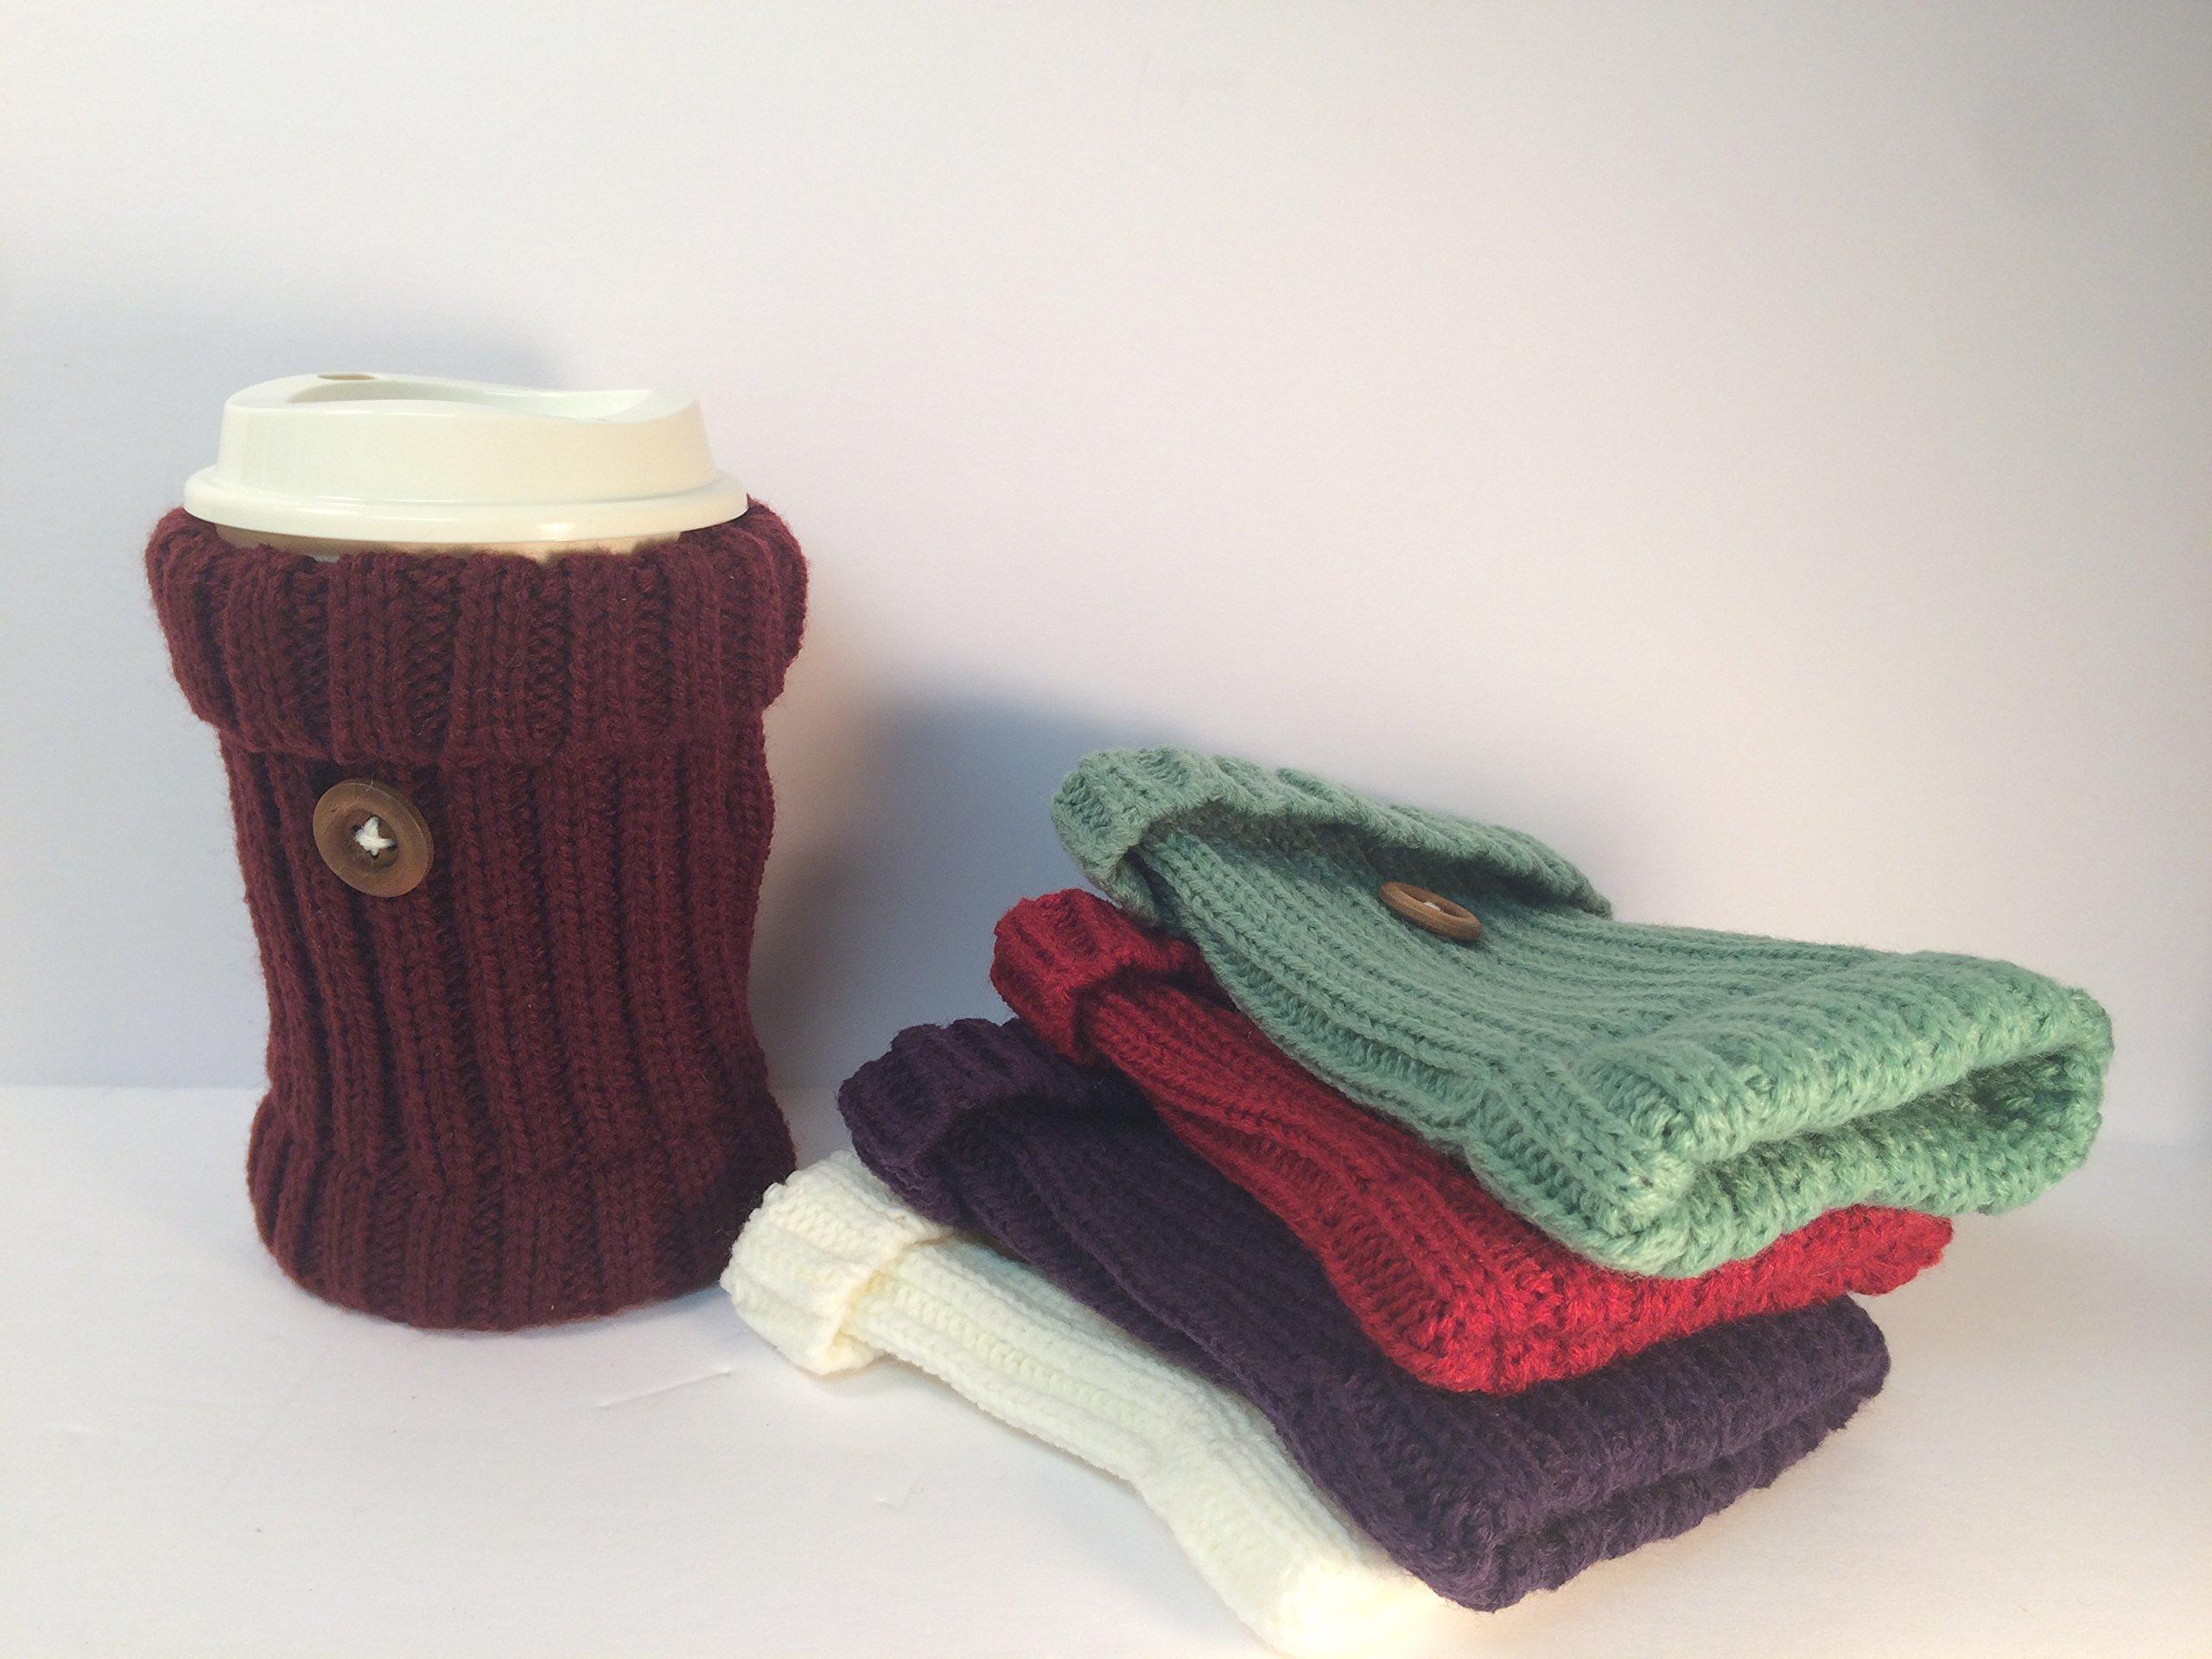 Cup Cozy Hand Warmer Cup Sleeves Hand Warmer Cozies Cup Sleeve Coffee Sleeve Hand Warmer Sleeve Tea Cozy Crochet Sleeve Denim Cozy